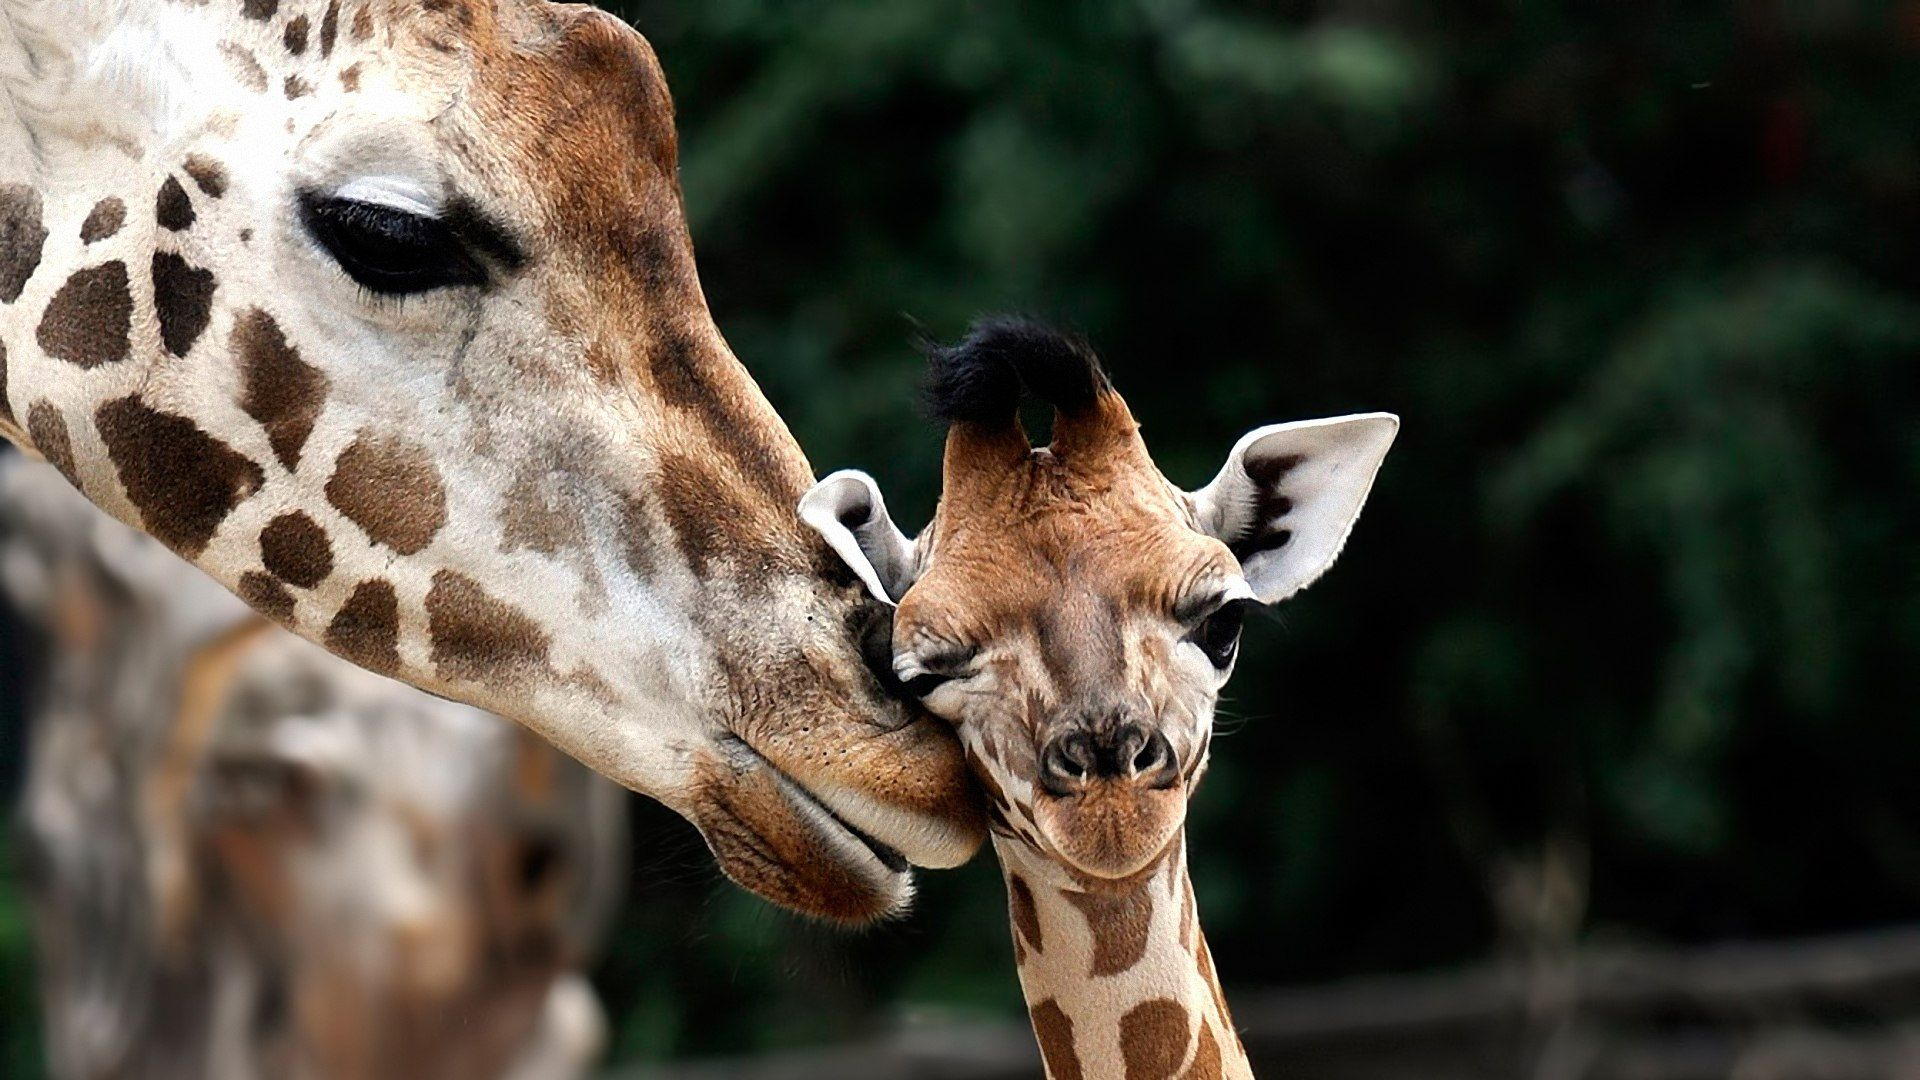 The Baby Giraffe